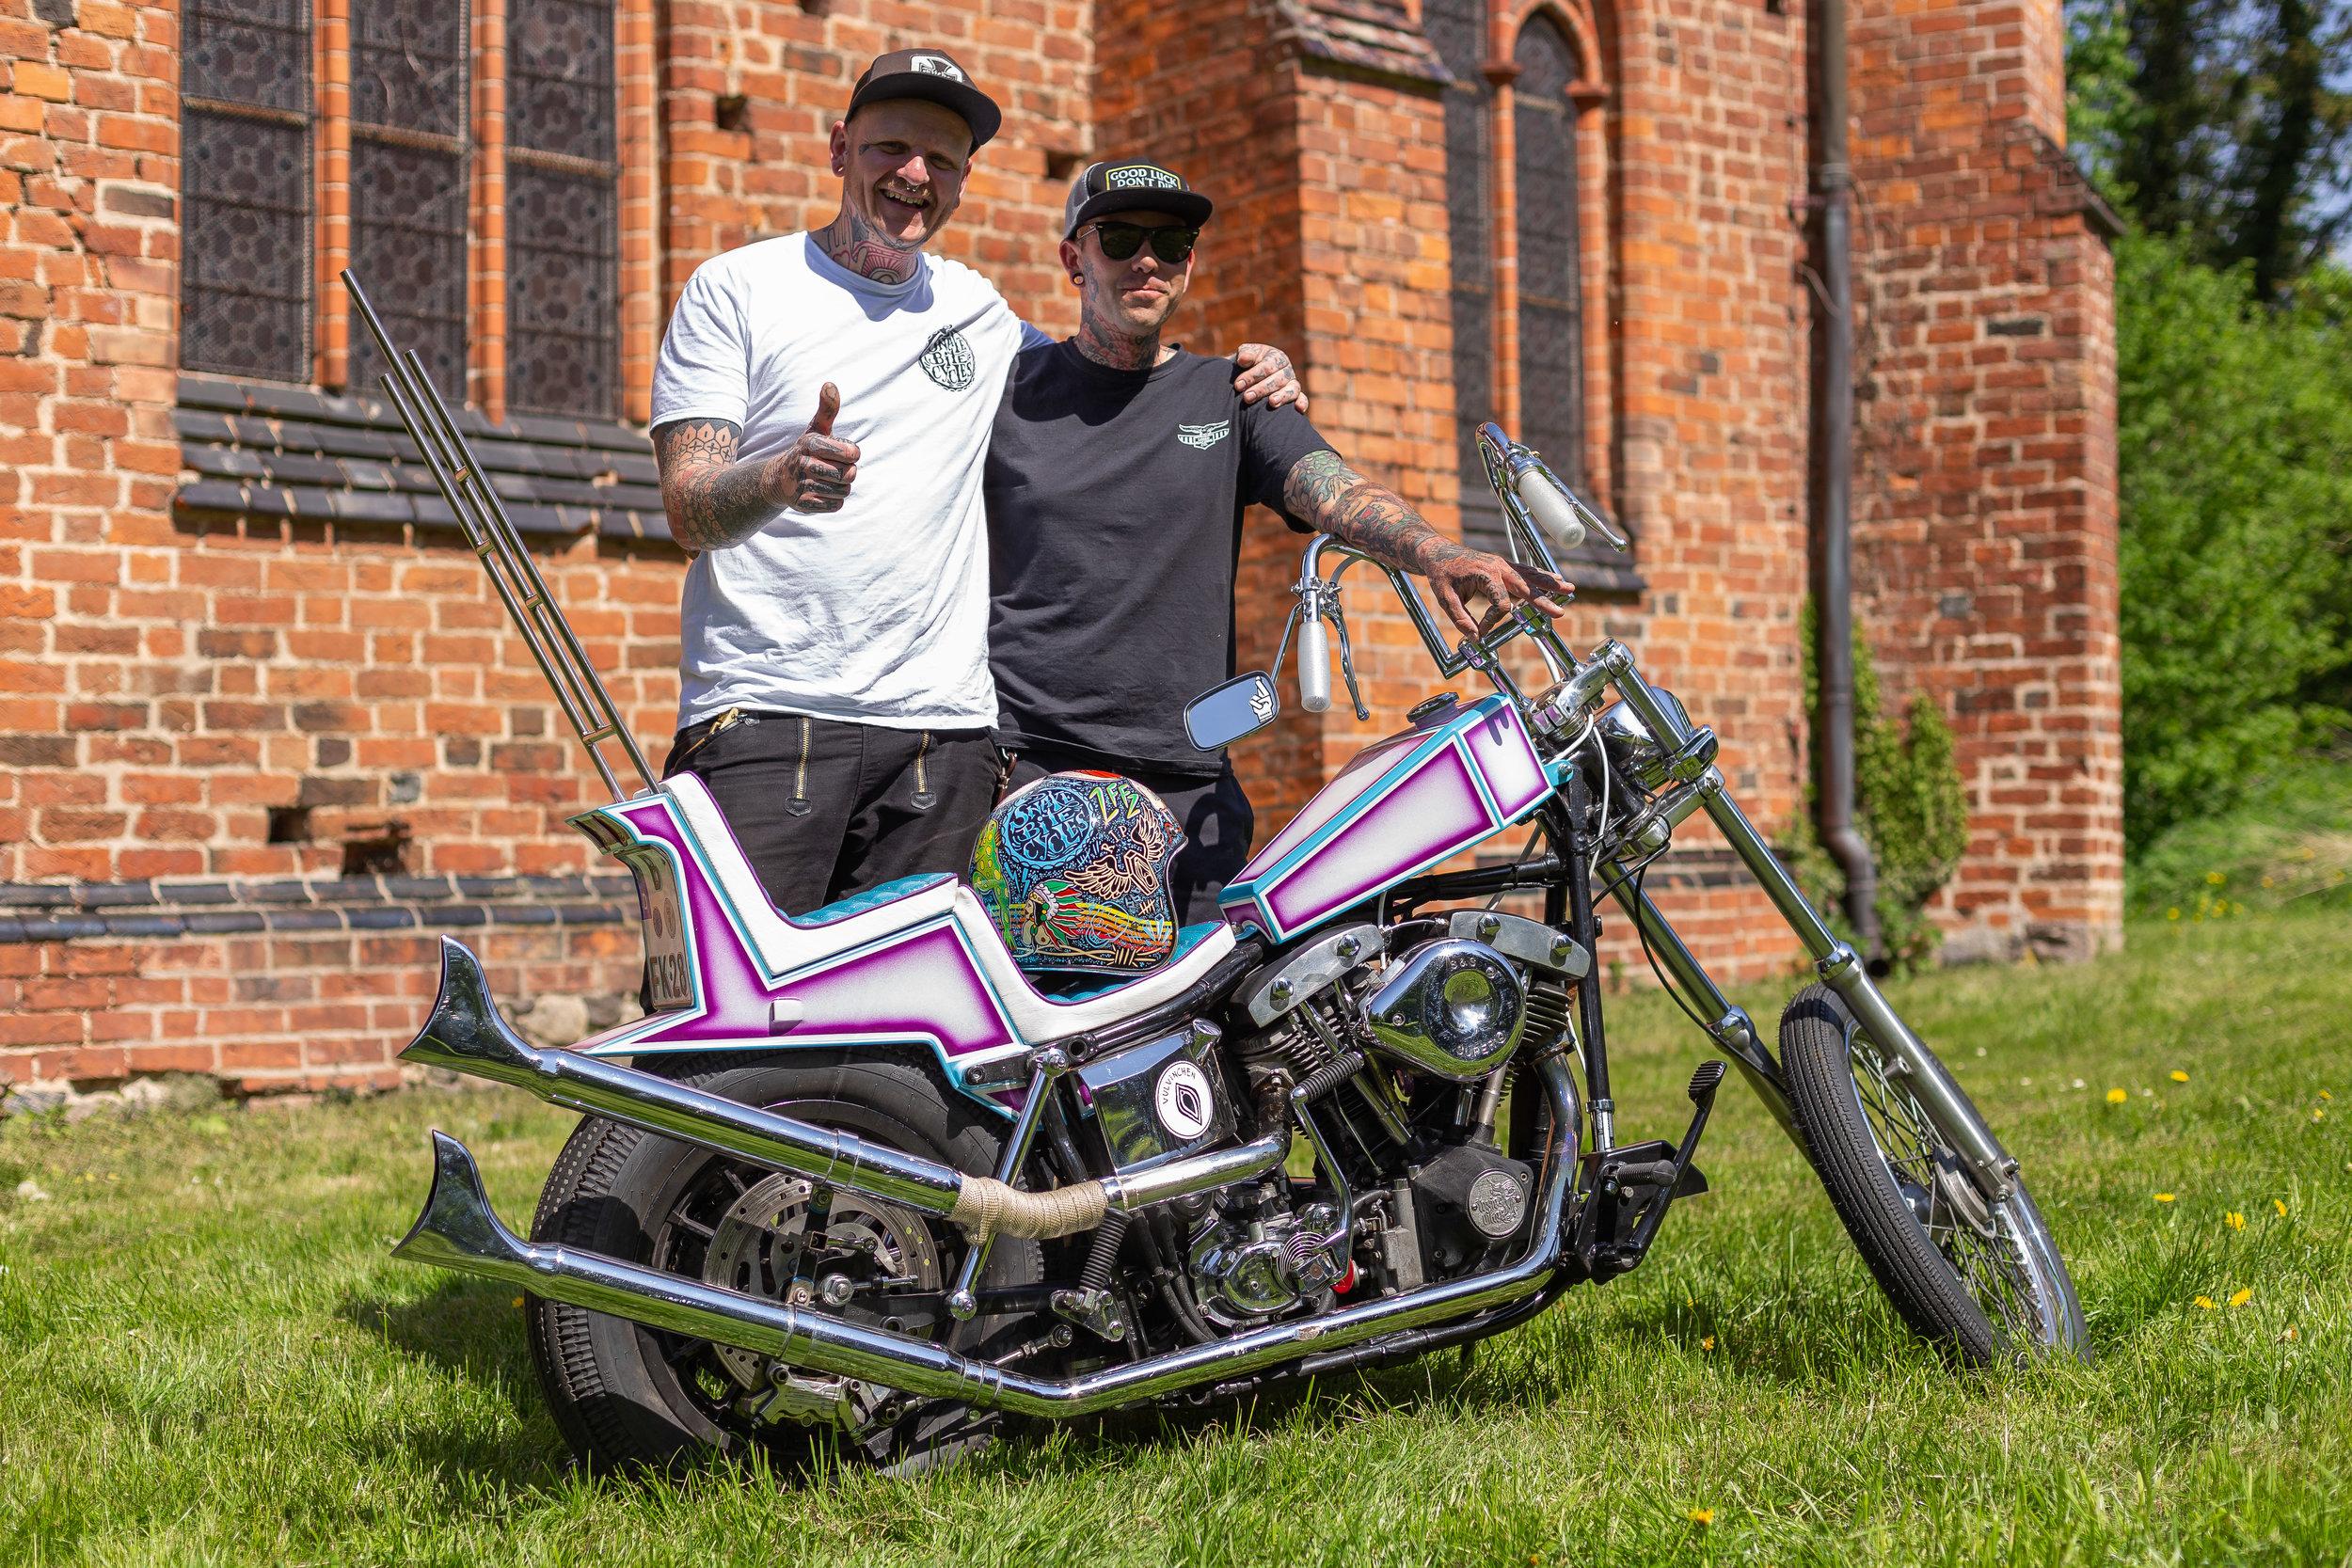 (c) Stefan Weidner Fotografie_Toxic Bikes_Karls Ofen_10-05-2018_IMG-0196.jpg